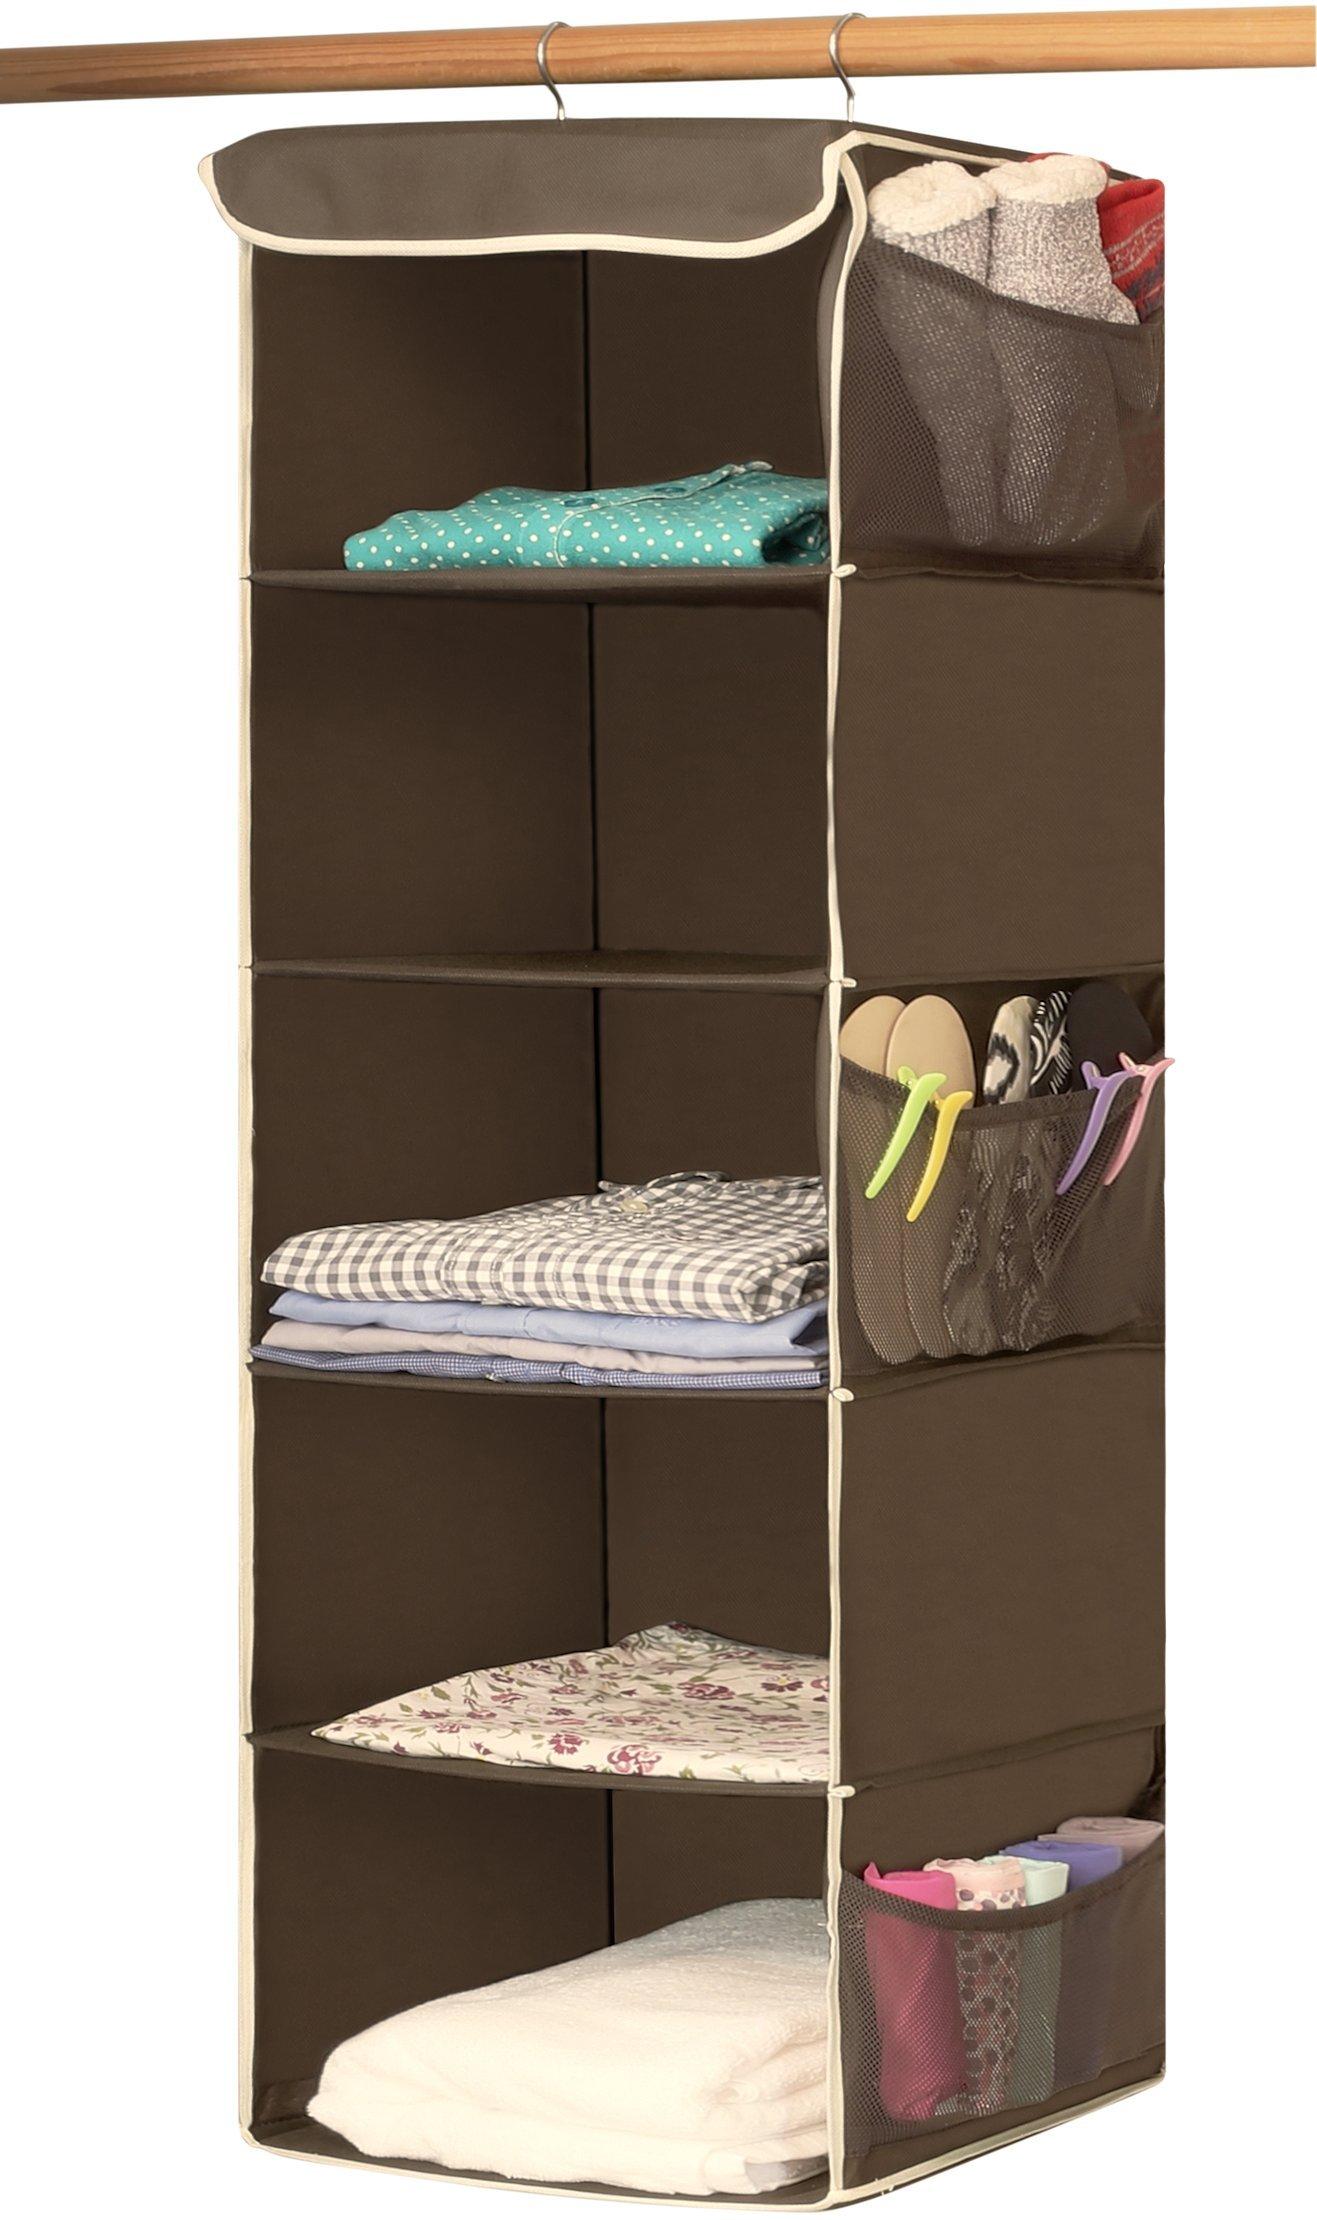 Simple Houseware 5 Shelves Hanging Closet Organizer, Bronze